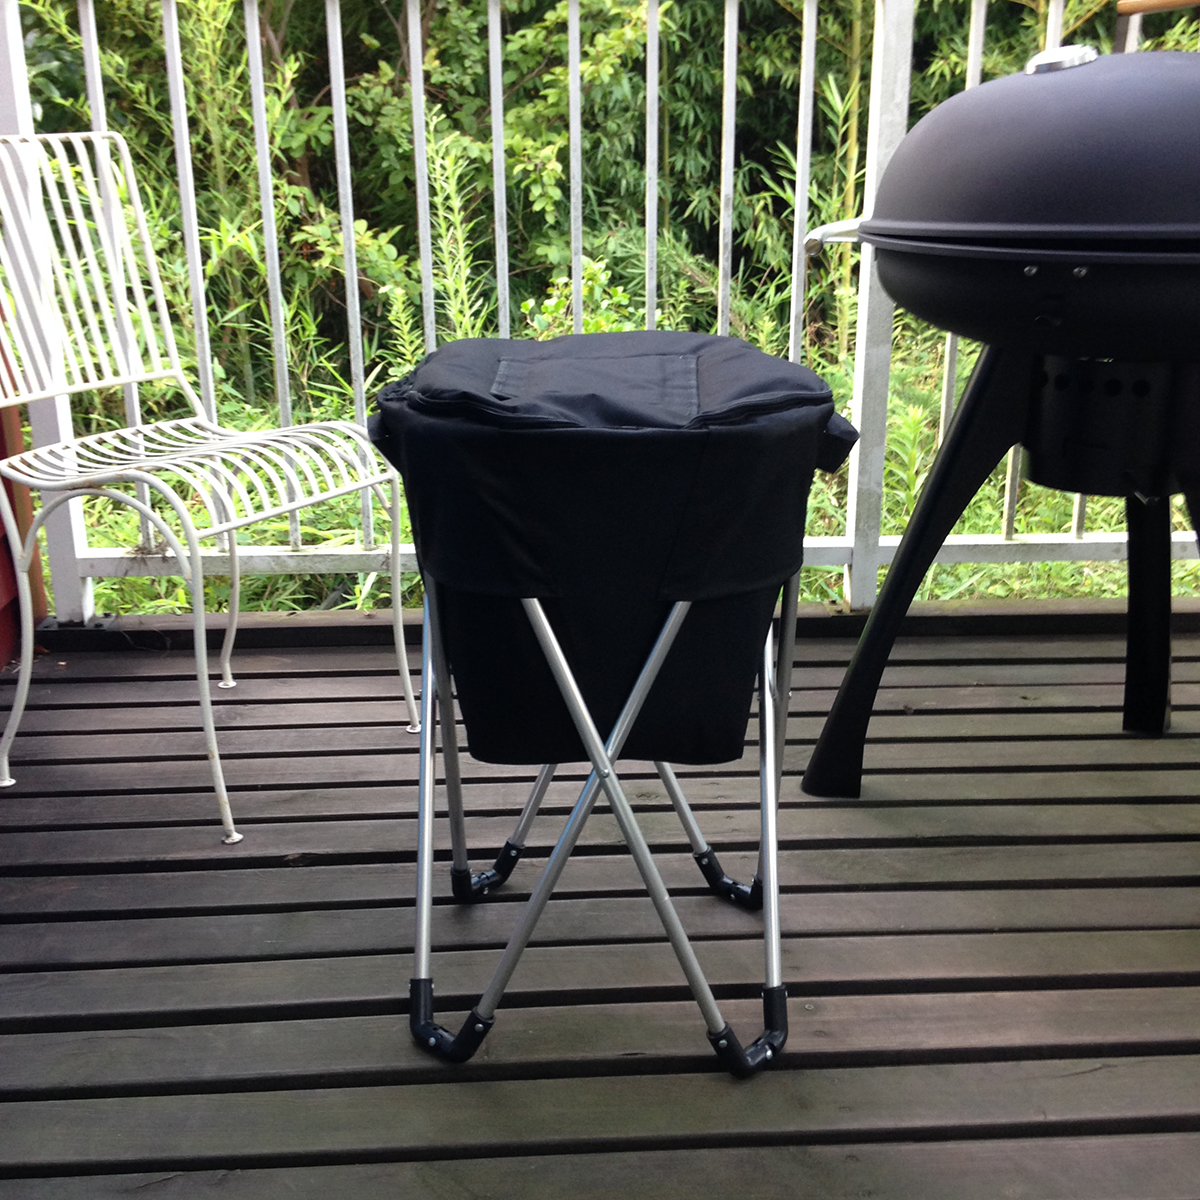 BBQやお花見・キャンプで大活躍。ビールもお肉も立ったまますぐ取り出せる、スタンド型クーラーバッグ|PARTY STAND COOLER